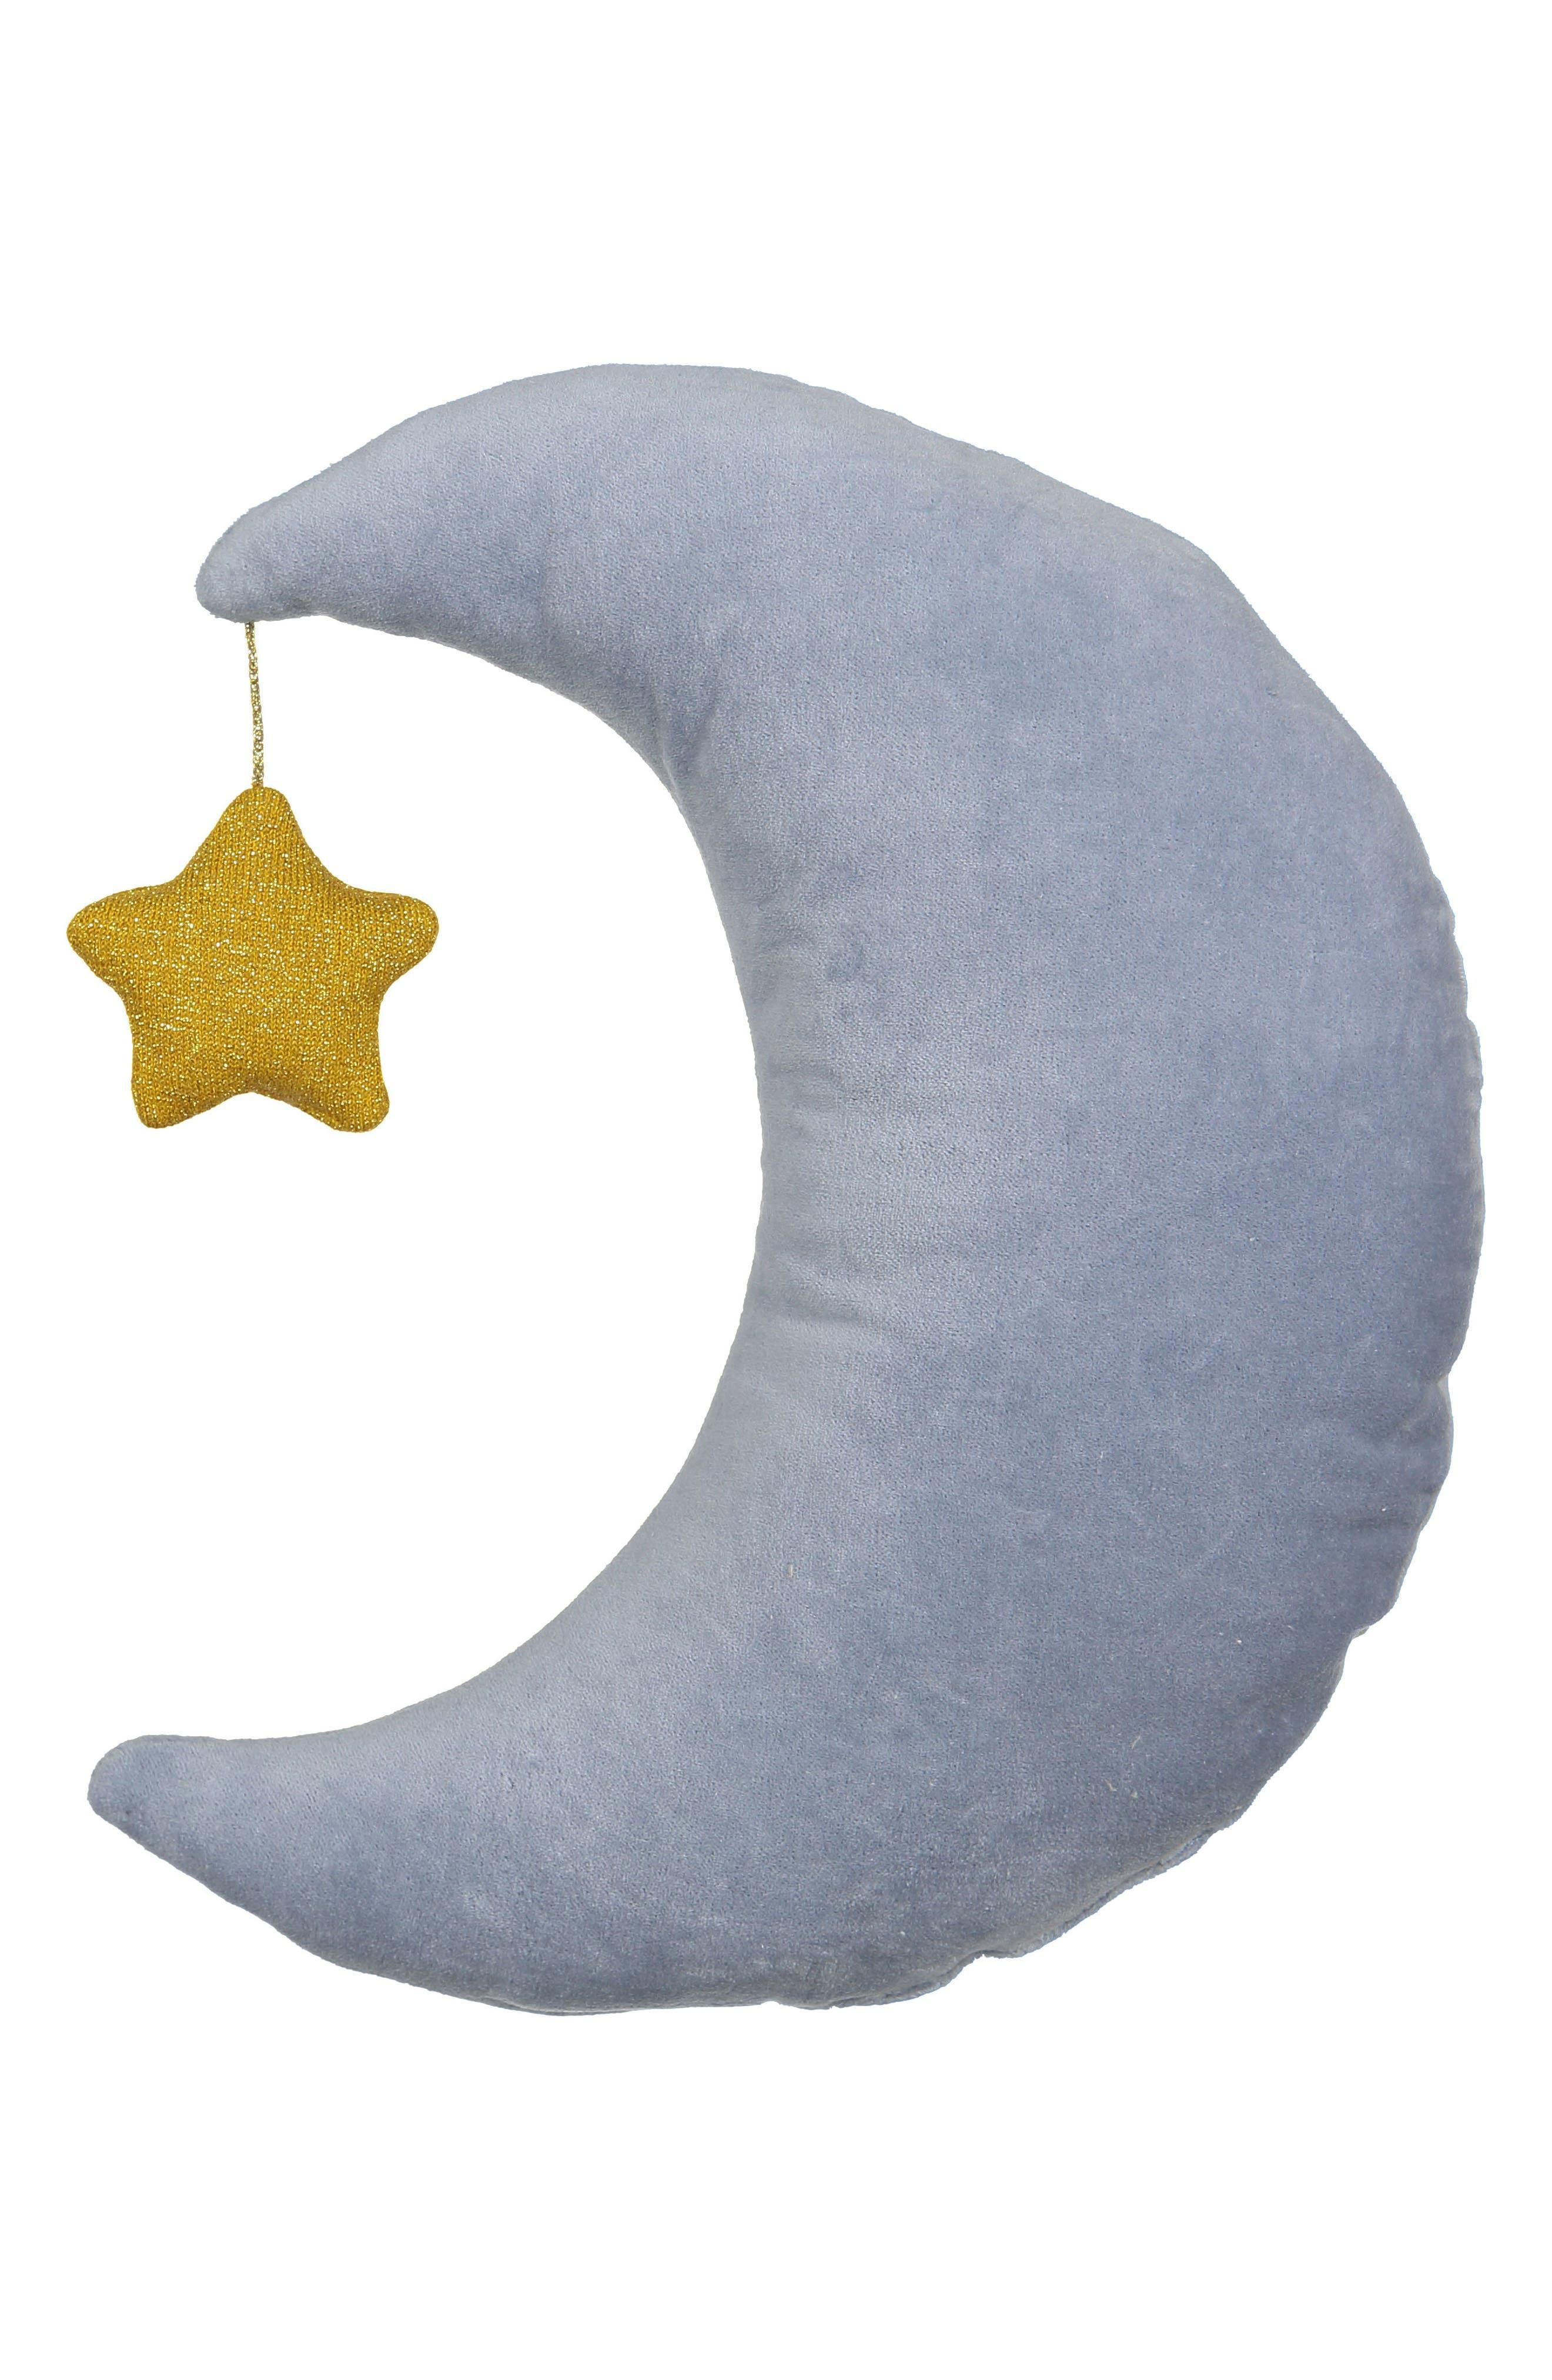 Meri Meri Organic Cotton Pillow